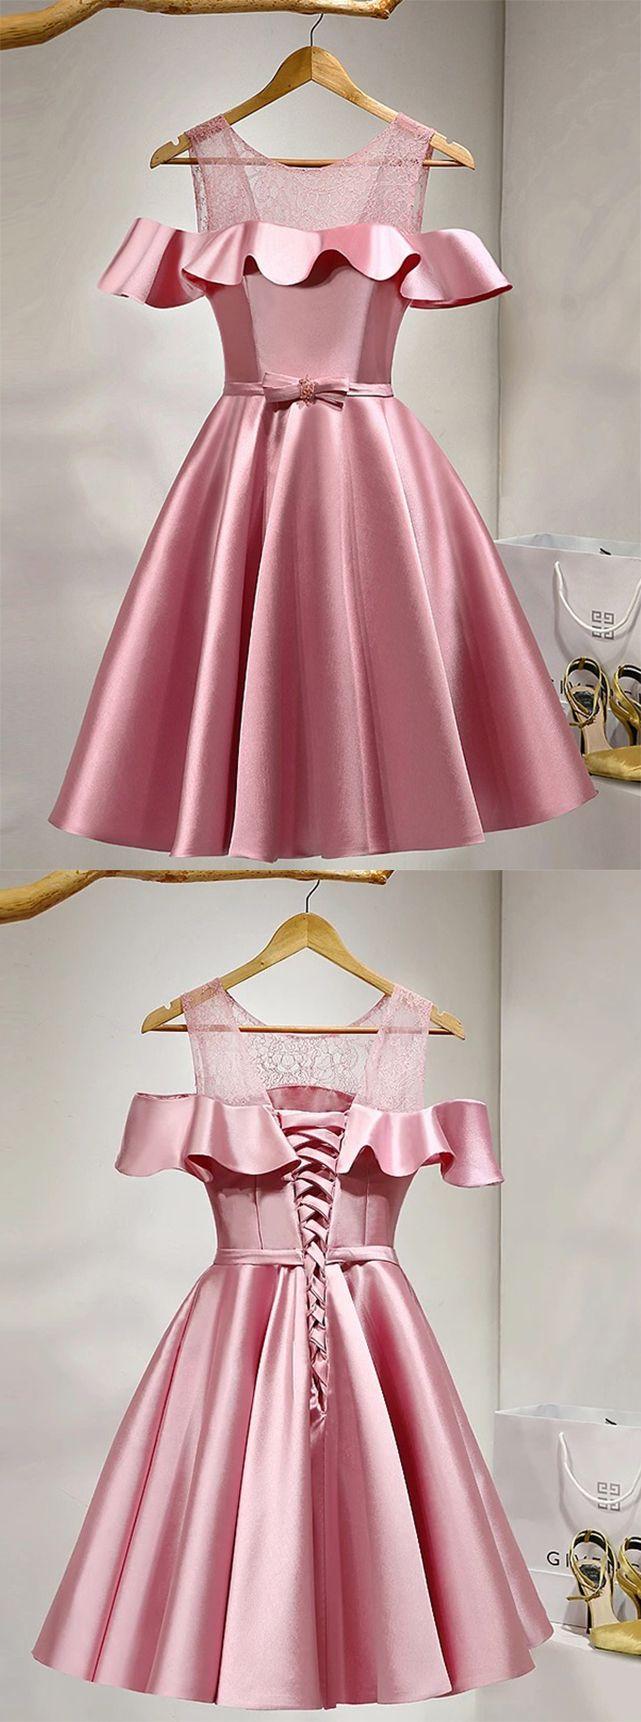 Pink Homecoming Dresses,Short Prom Dresses,Girls Cocktail Dress,Homecoming Dress,Graduation Dress,Cute Party Dress,Short Homecoming Dress